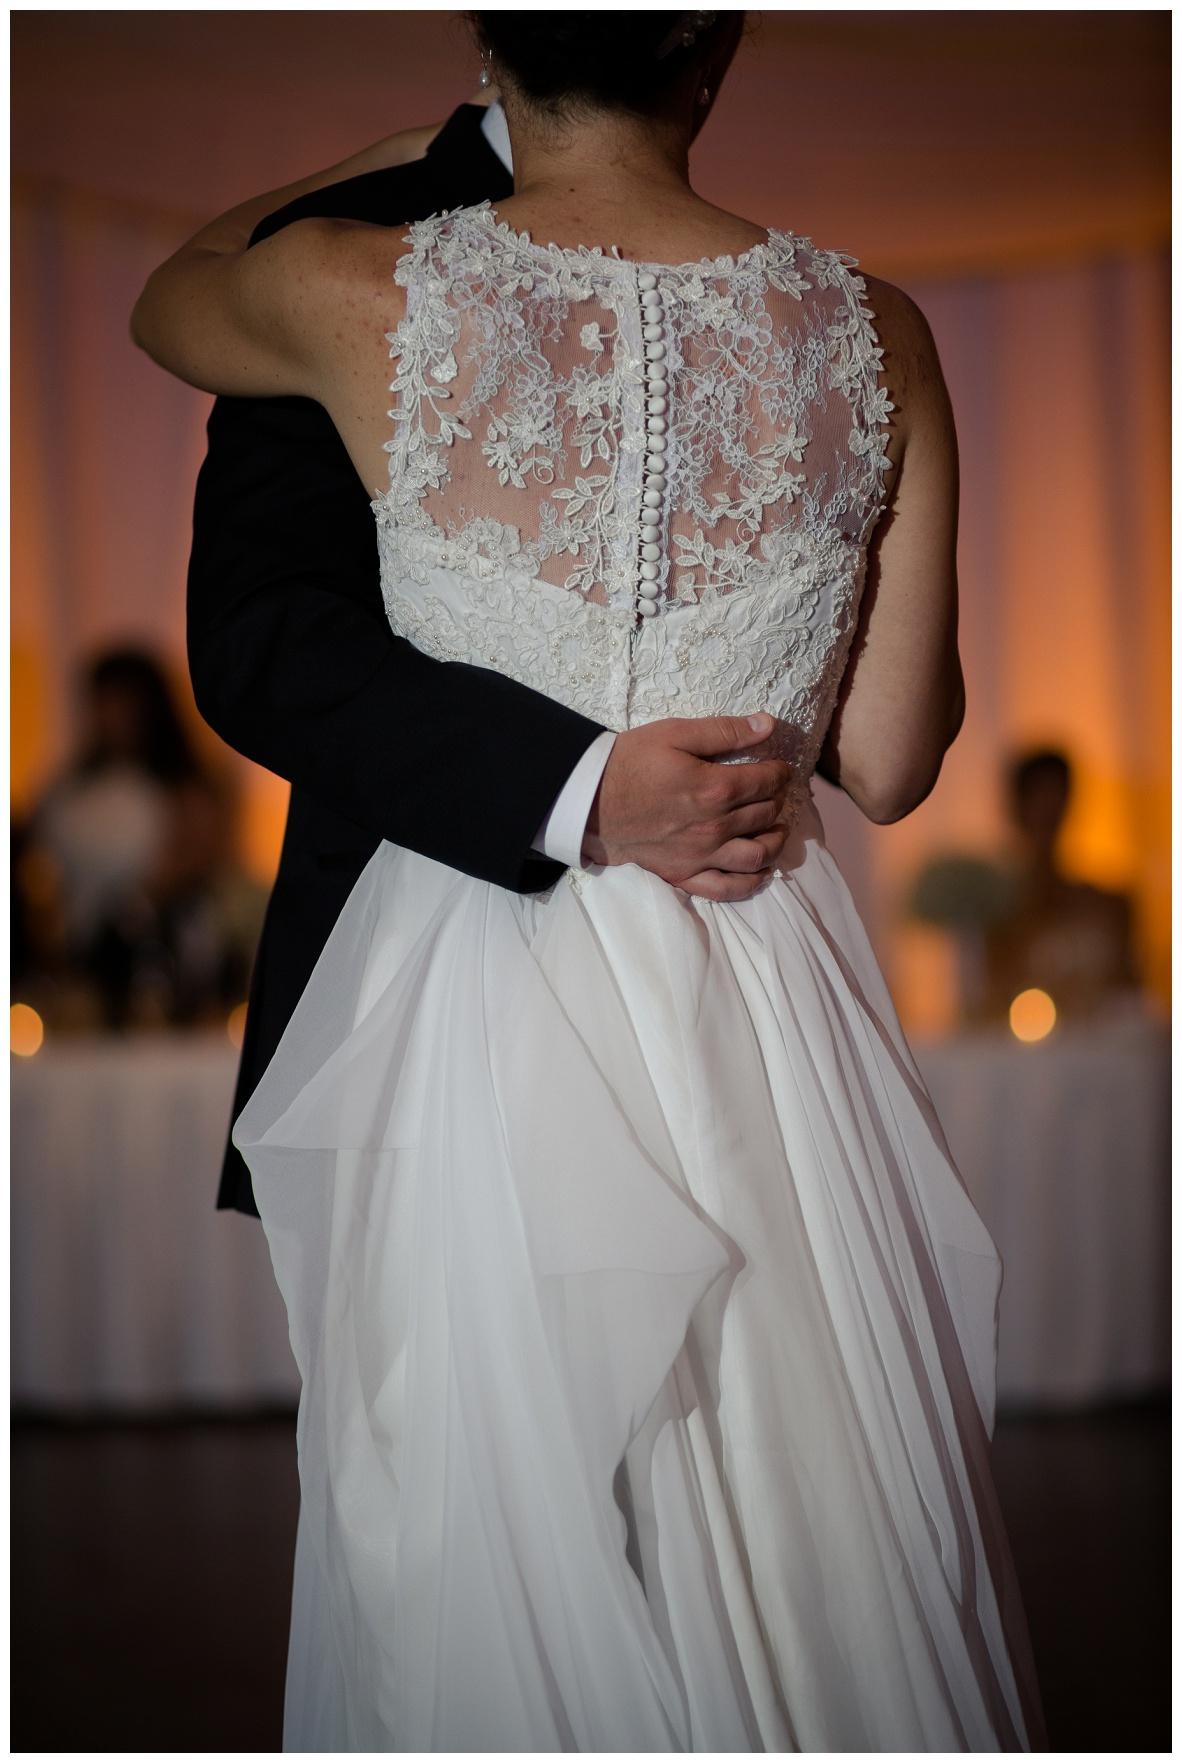 The Wedding of Danielle and Matt_0071.jpg